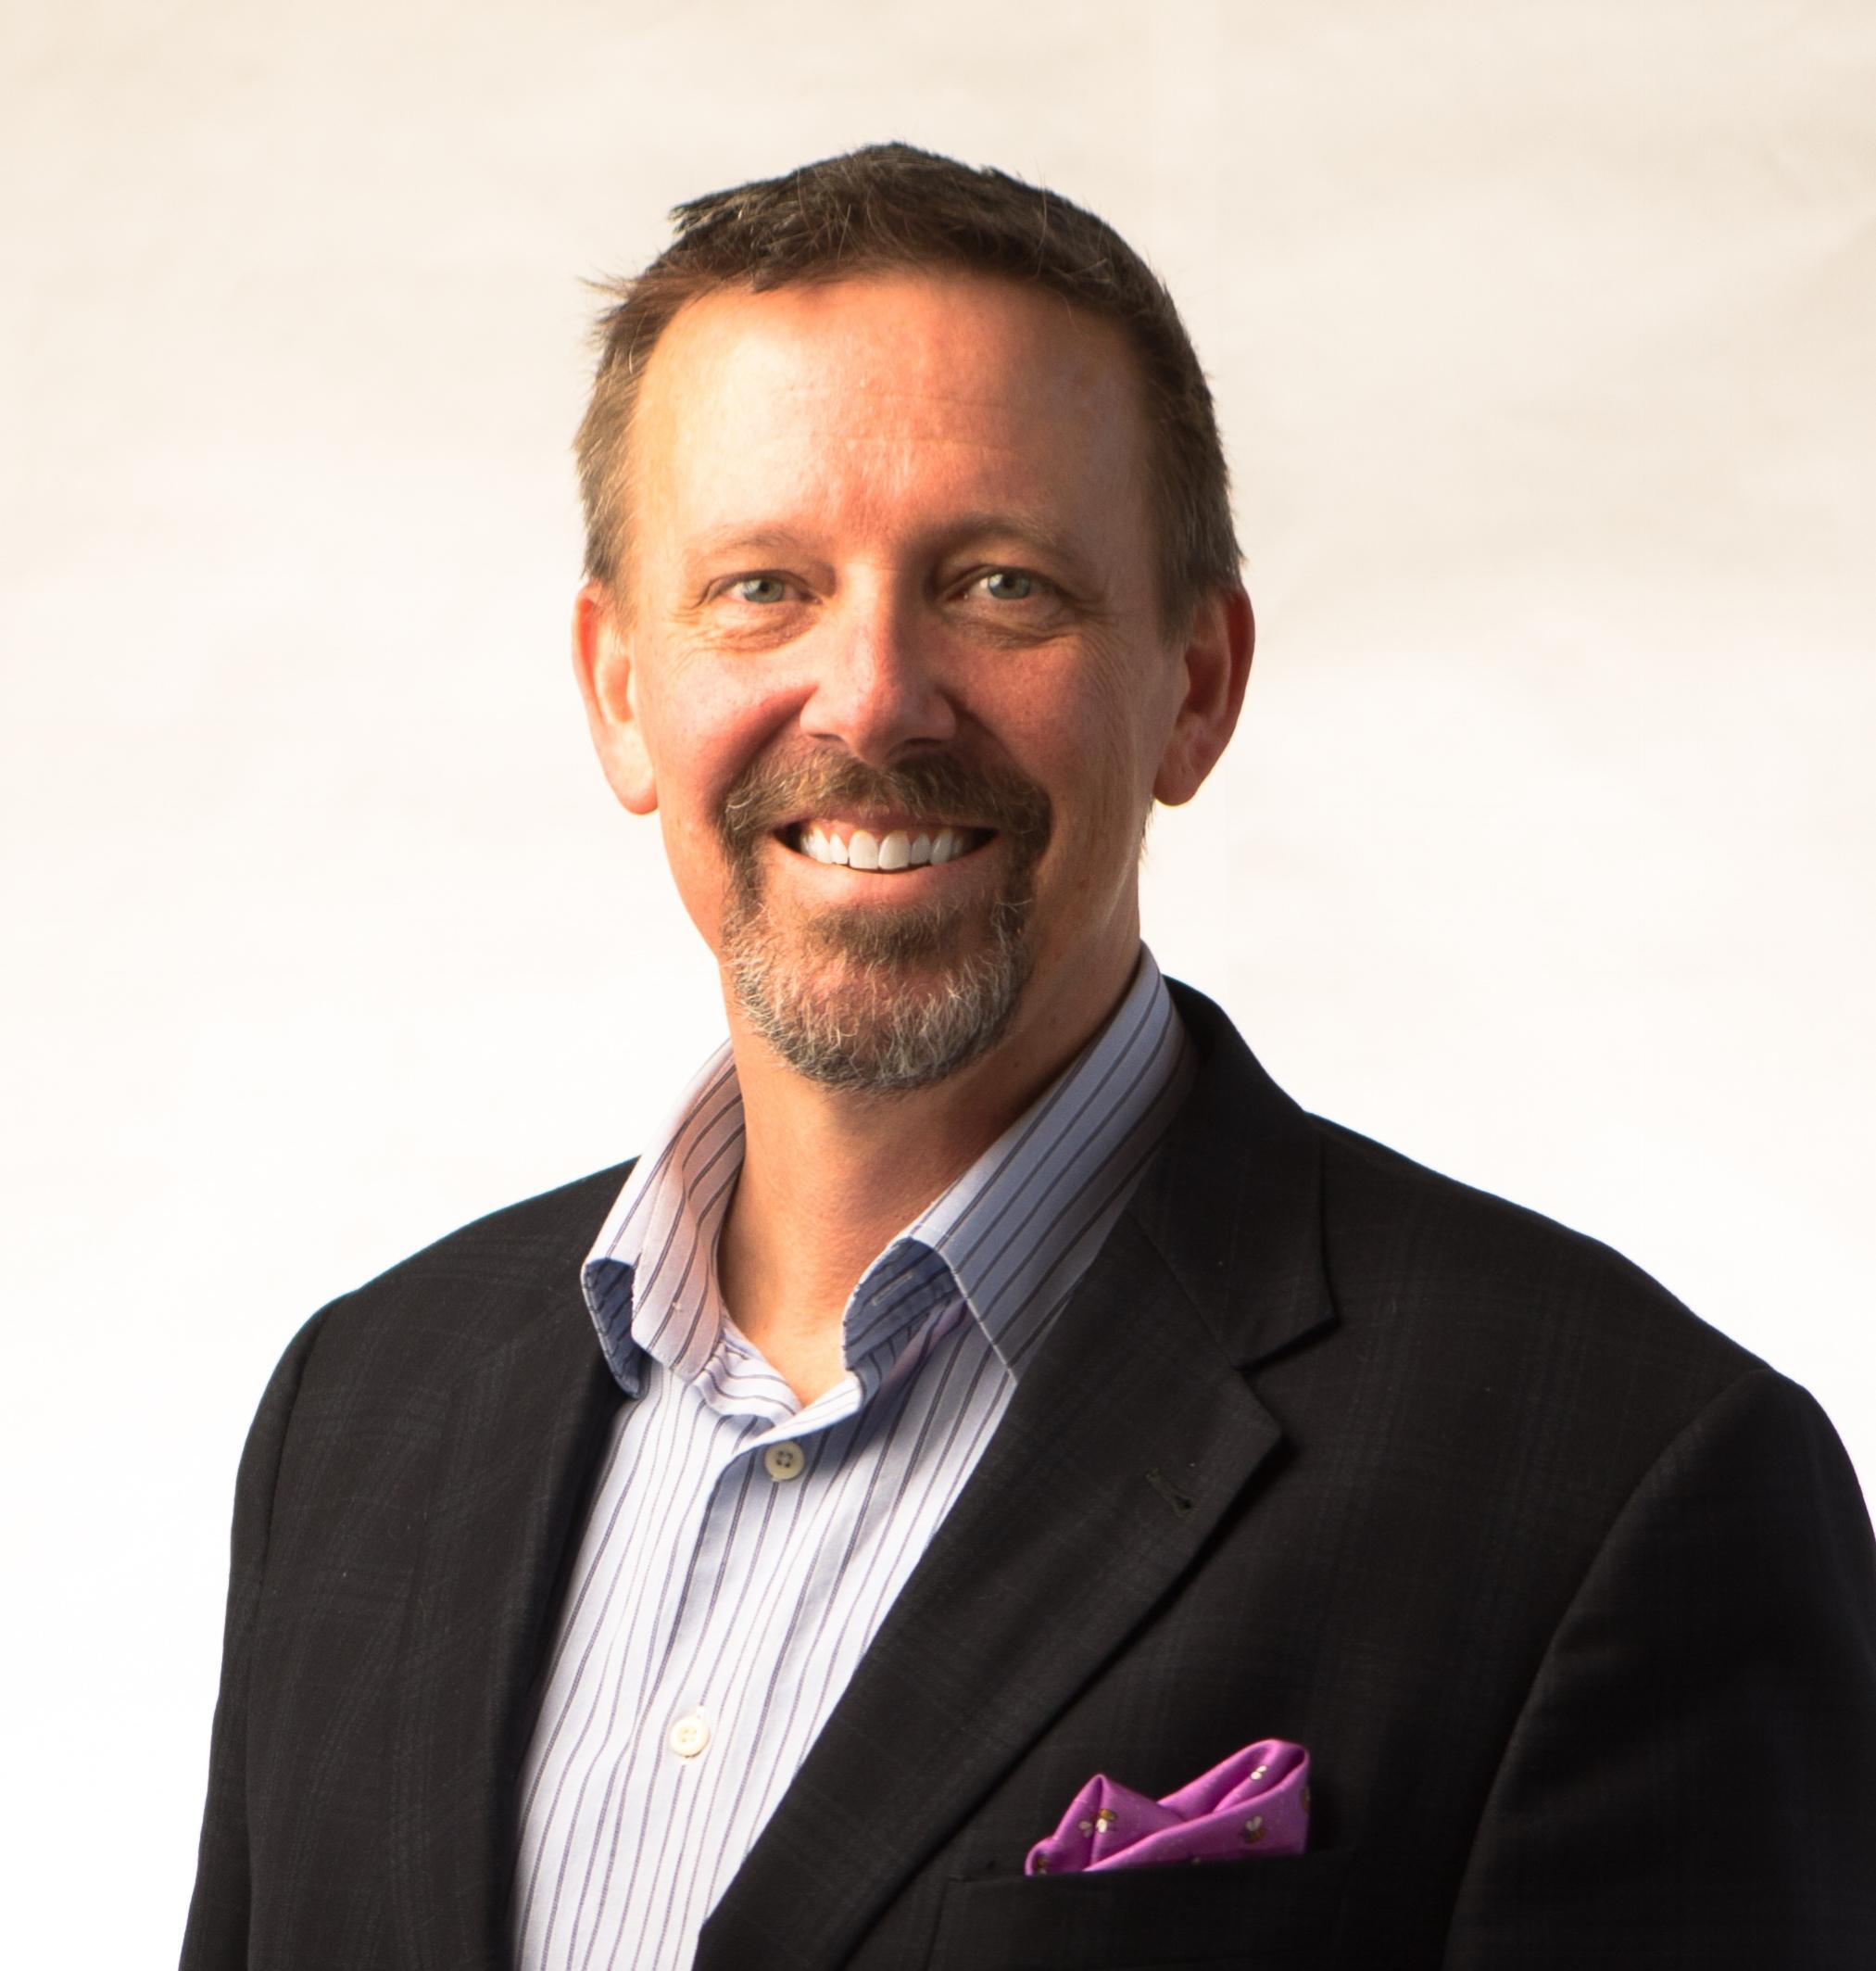 Jeffrey Pomranka - Executive Director